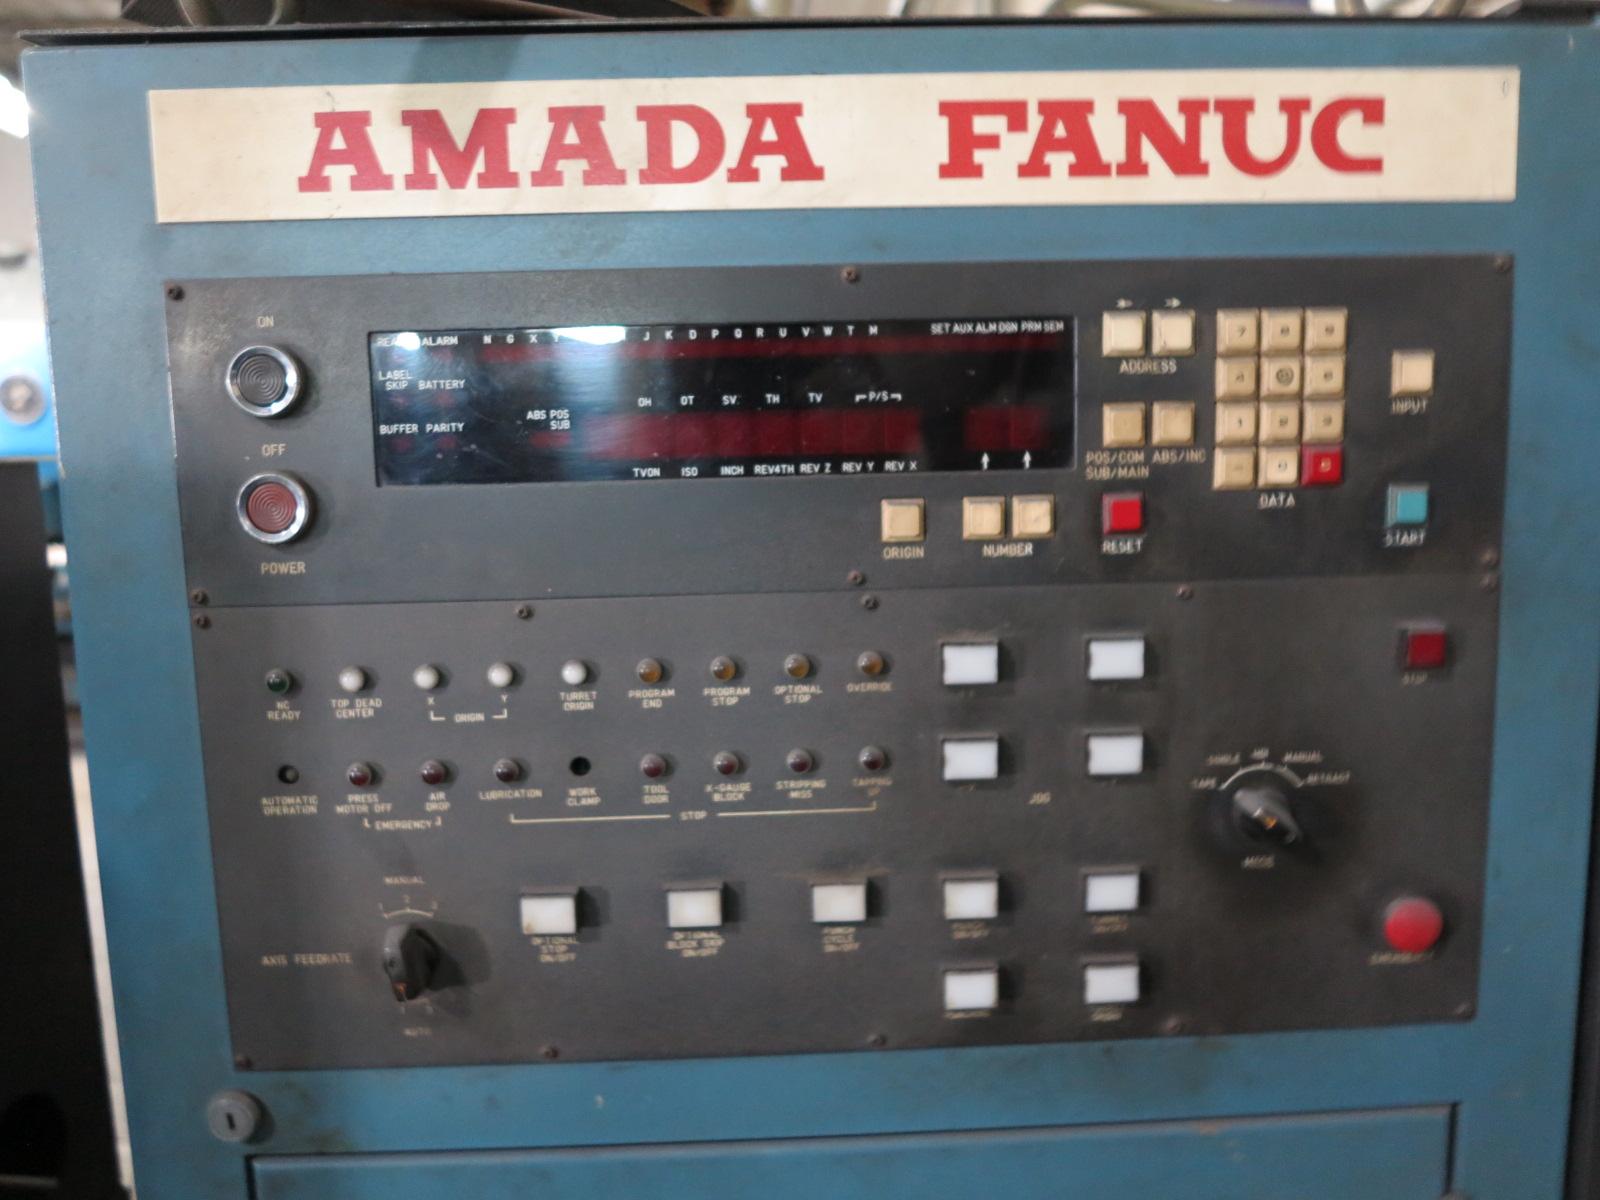 1981 AMADA PEGA 344 TURRET PUNCH, 30-TON, 56-STATION, THICK TURRET, S/N P3440465 - Image 4 of 4